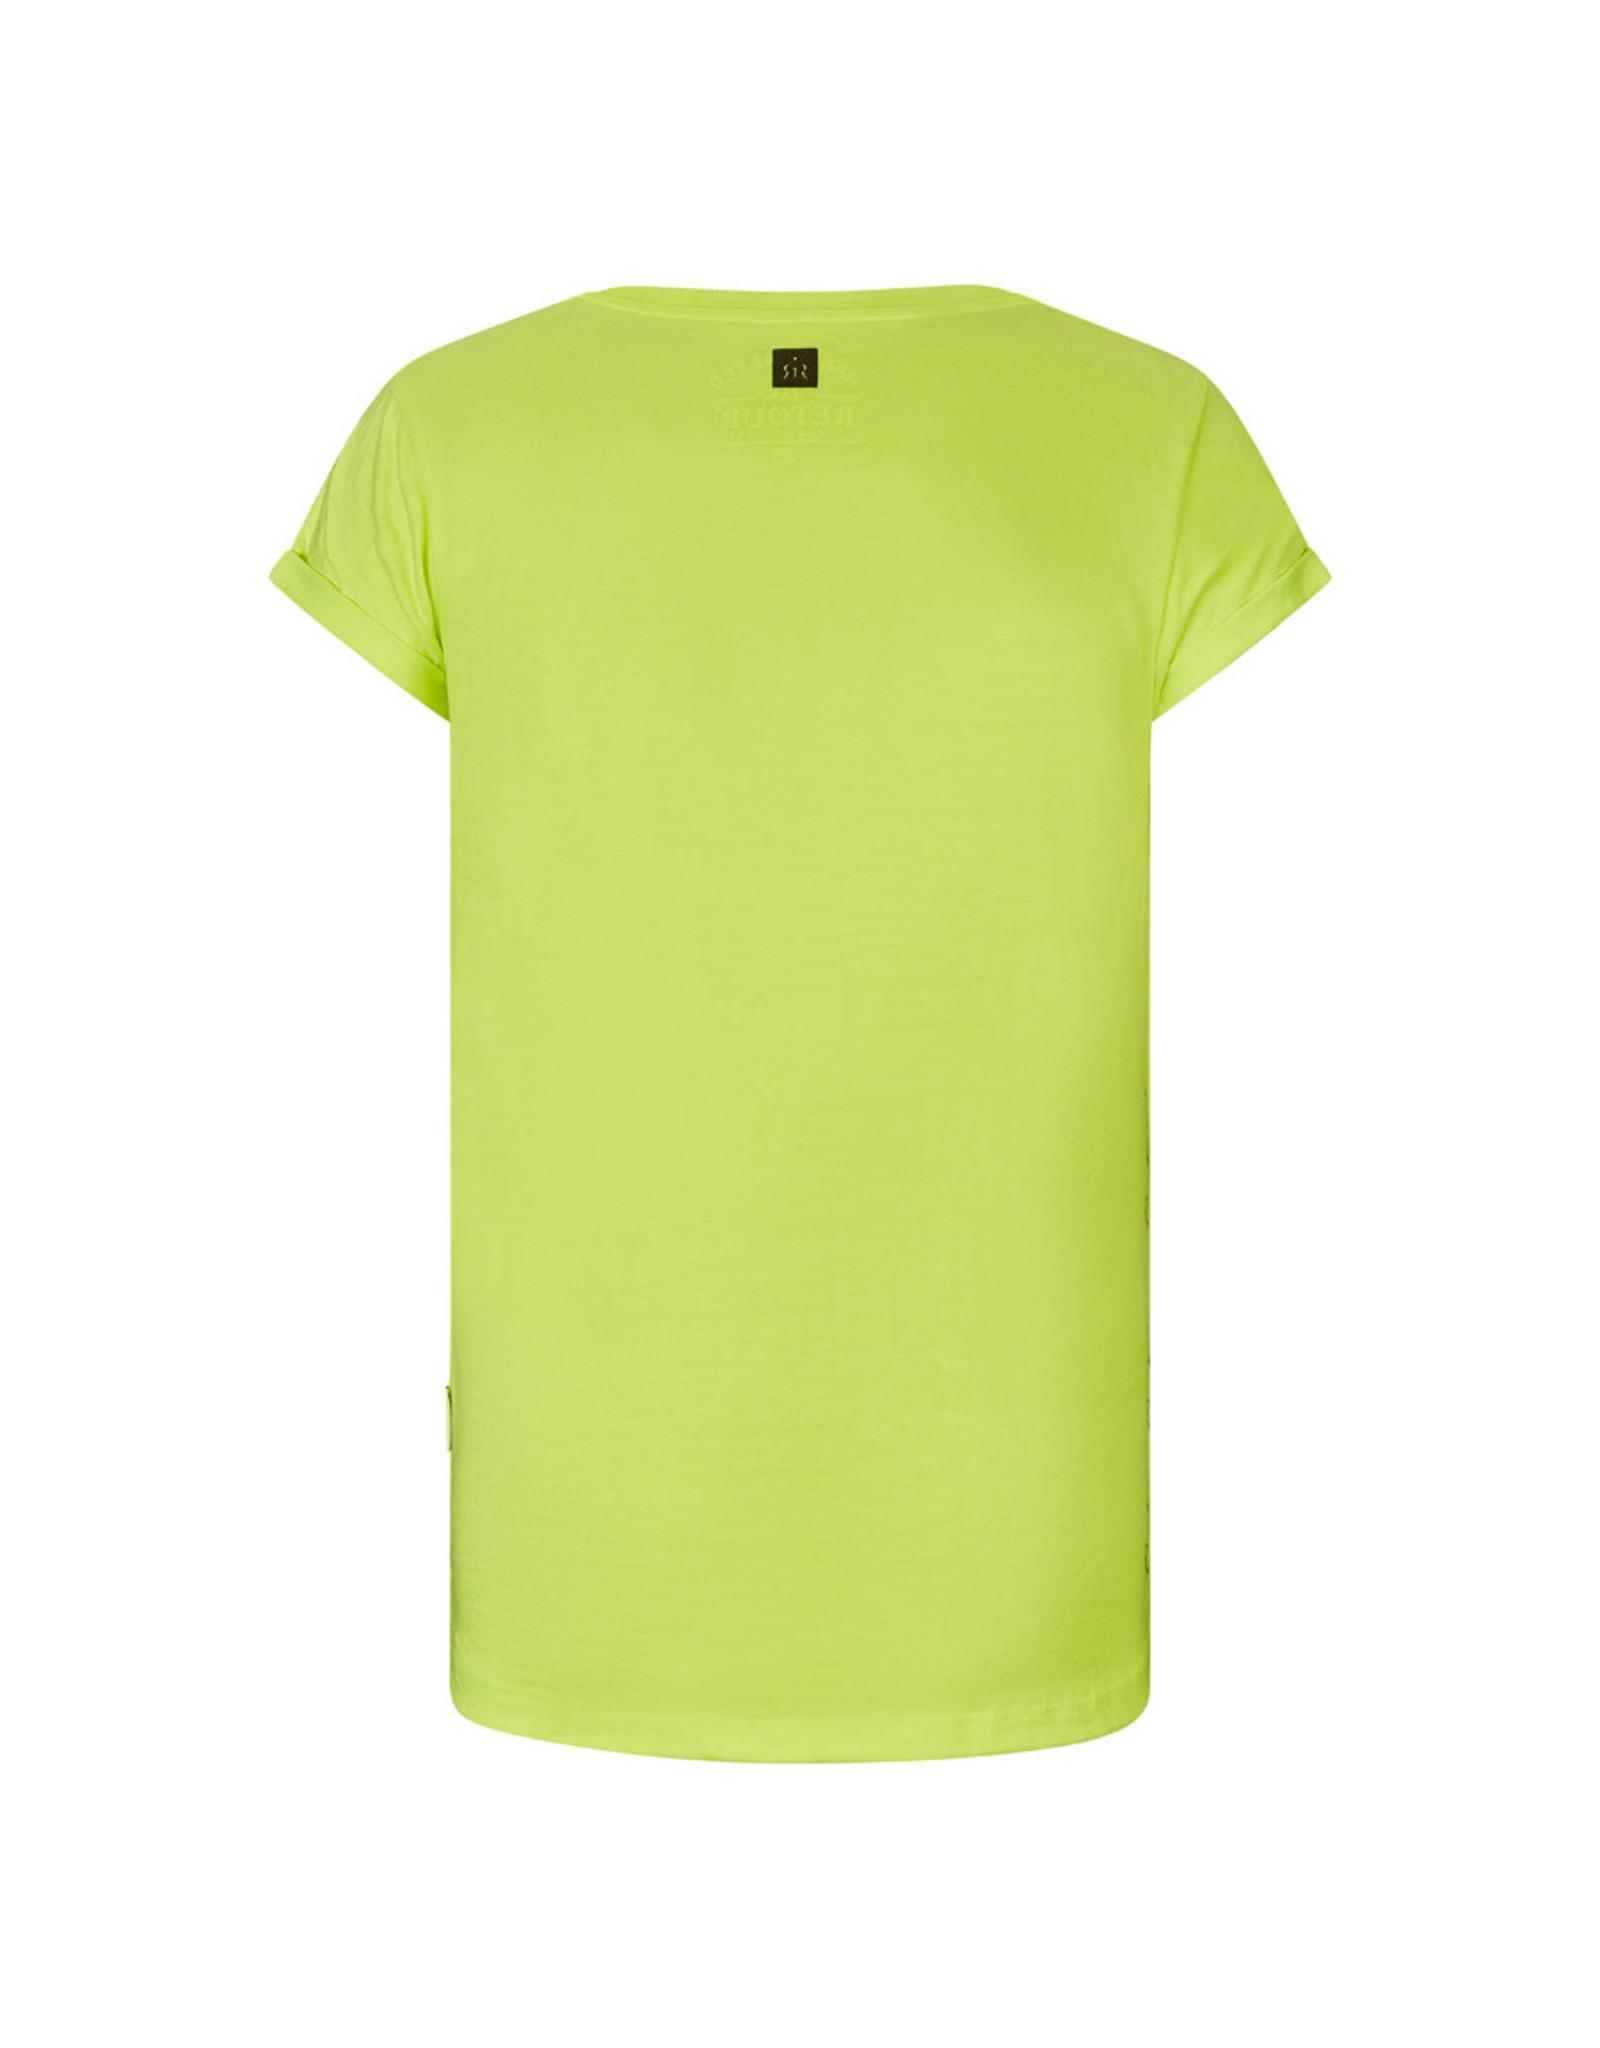 RETOUR Retour meiden t-shirt Maribelle Yellow